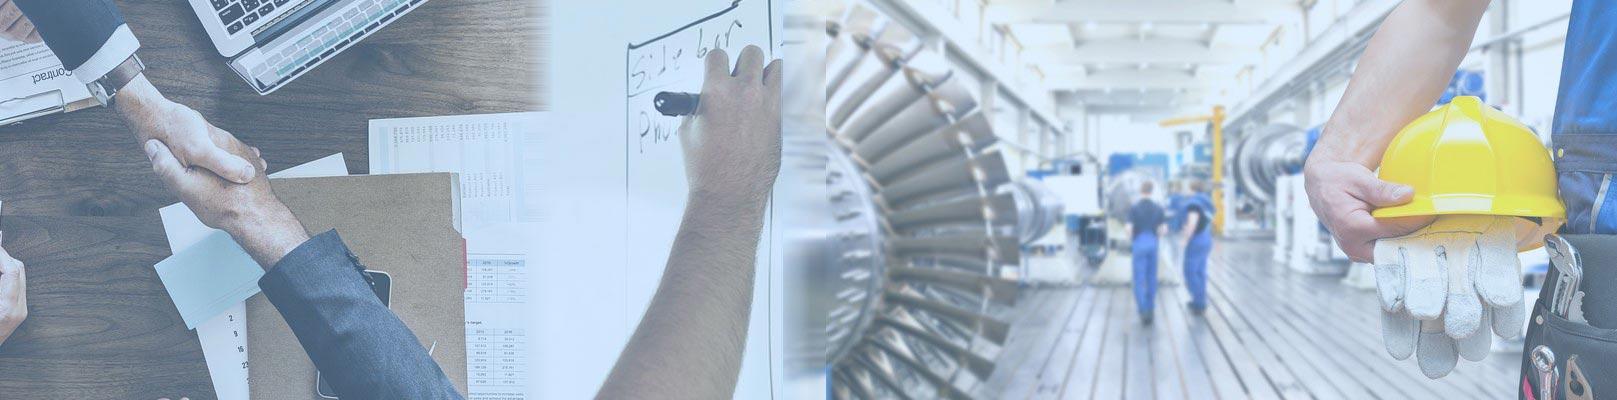 Nos Engagements - EDMR Engineering Rhône